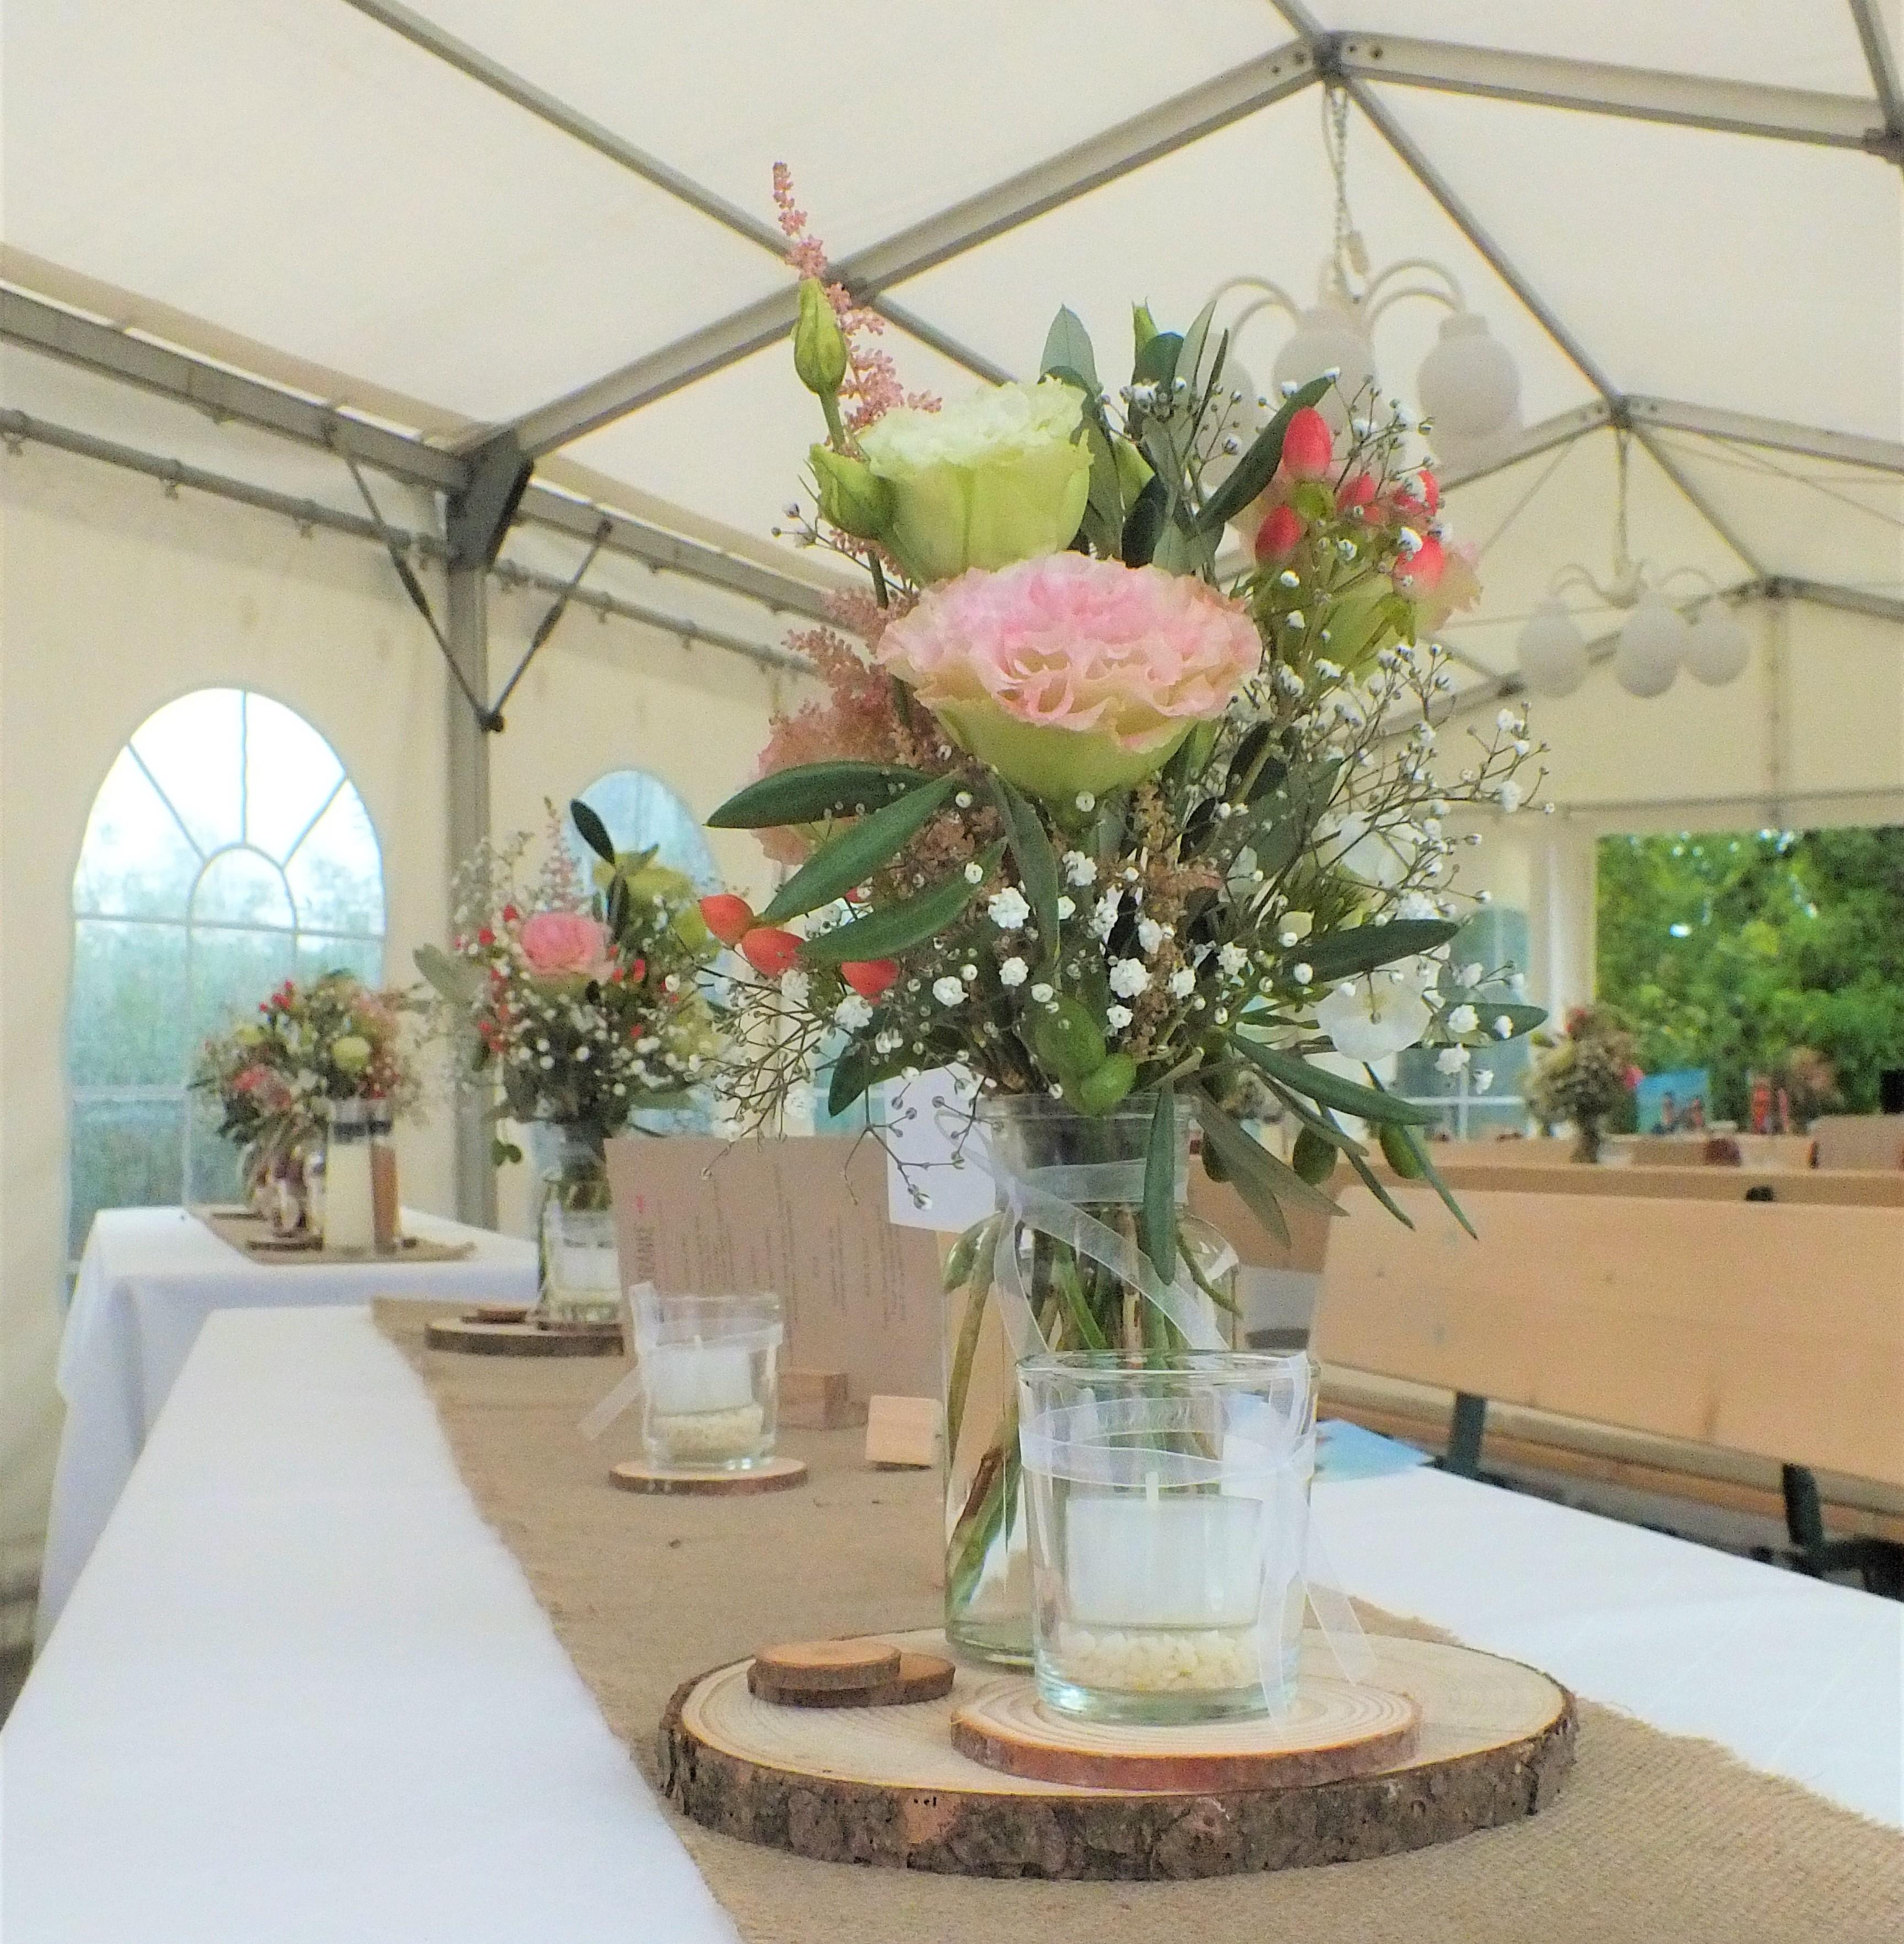 floral designer, eventfloristik, boho tischdeko